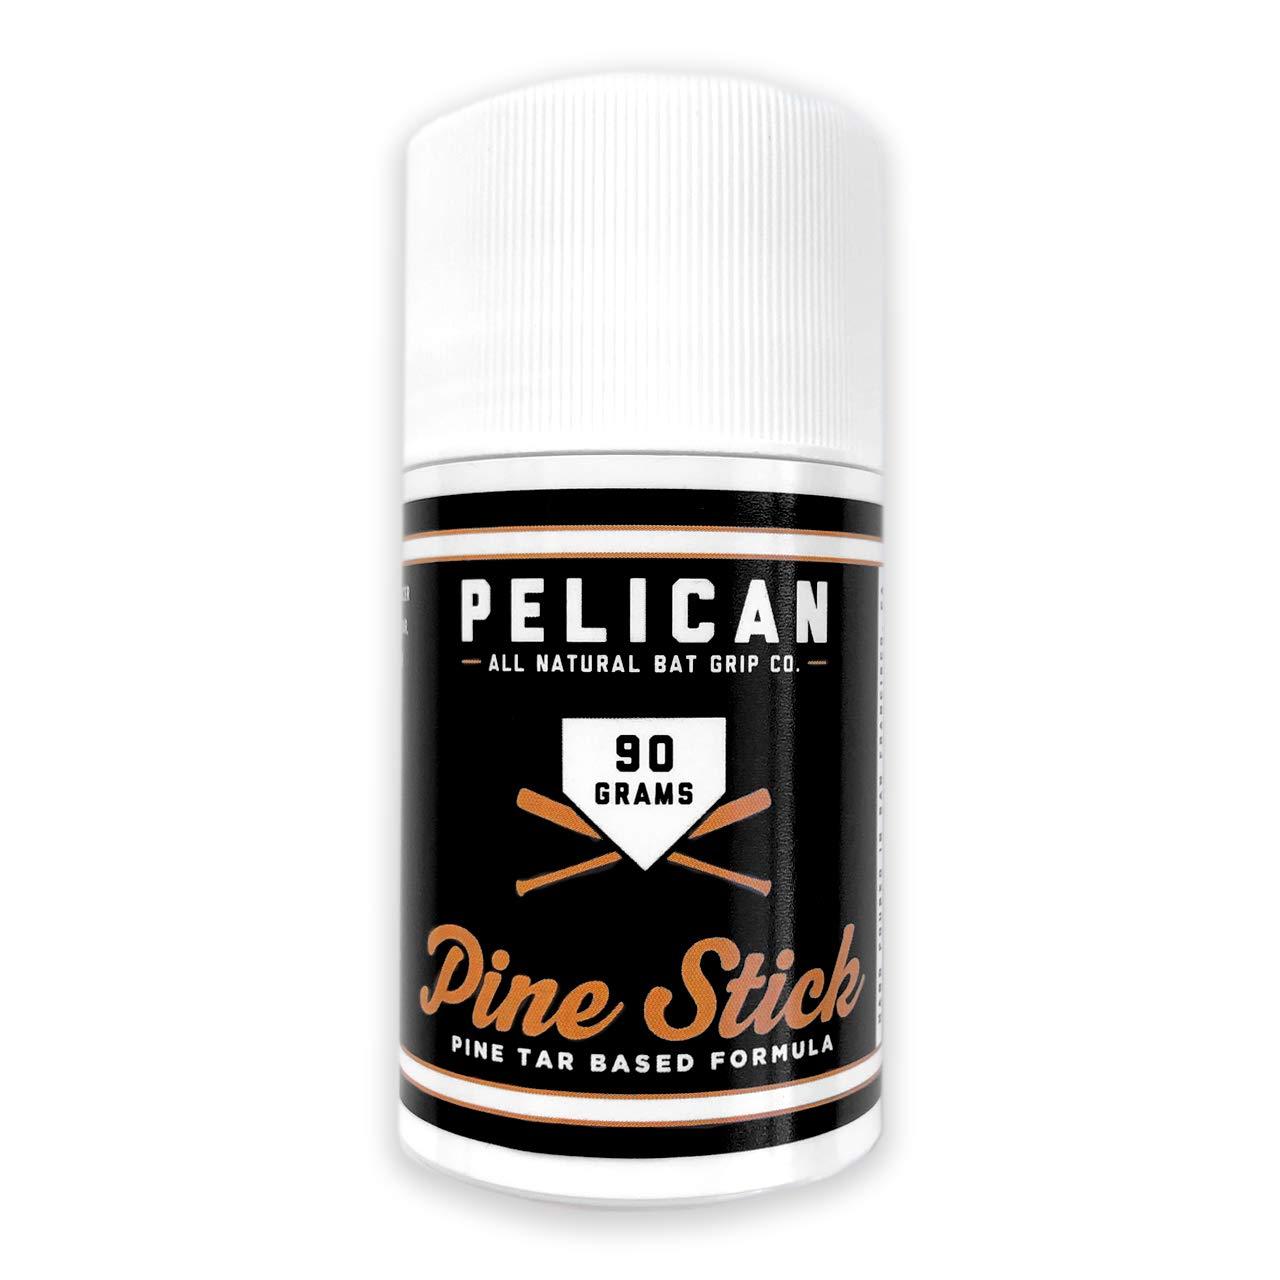 Pine Tar Baseball Stick Pelican Bat Wax Tar XL for Baseball or Softball Bat Enhanced Grip - 90 Gram by Pelican